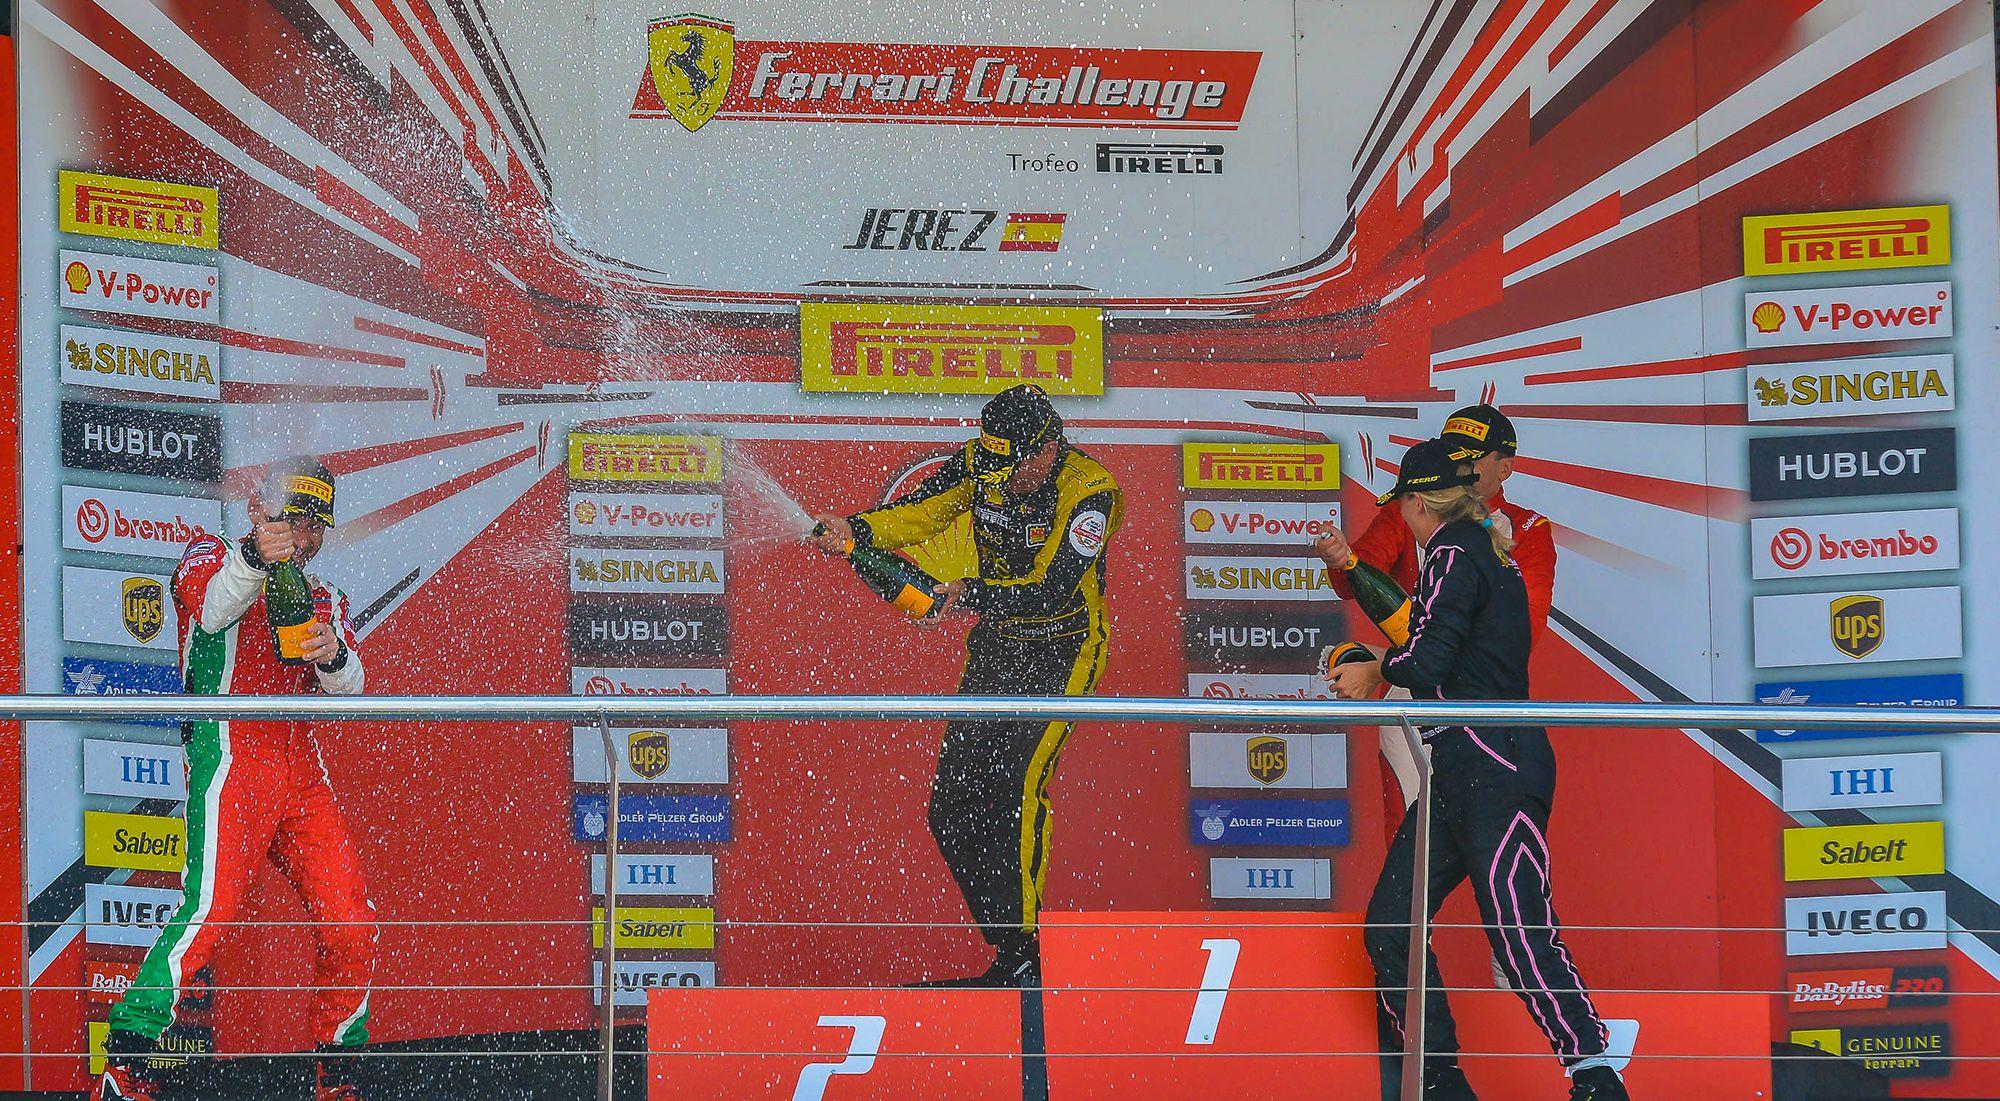 Celebración de los ganadores Ferrari Challenge en Jerez | Christian Cantizano para MIRA Jerez